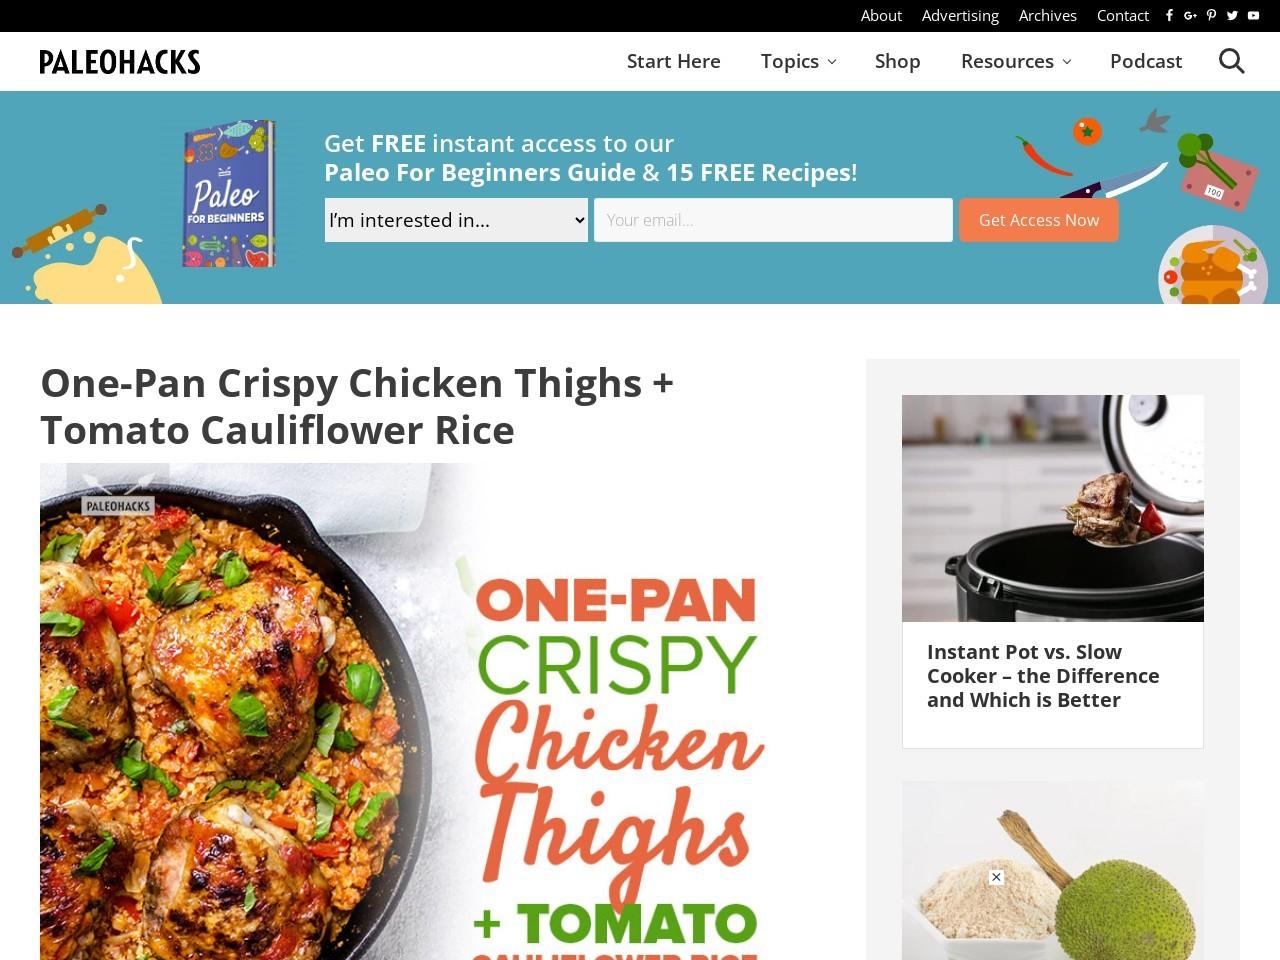 One-Pan Crispy Chicken Thighs + Tomato Cauliflower Rice